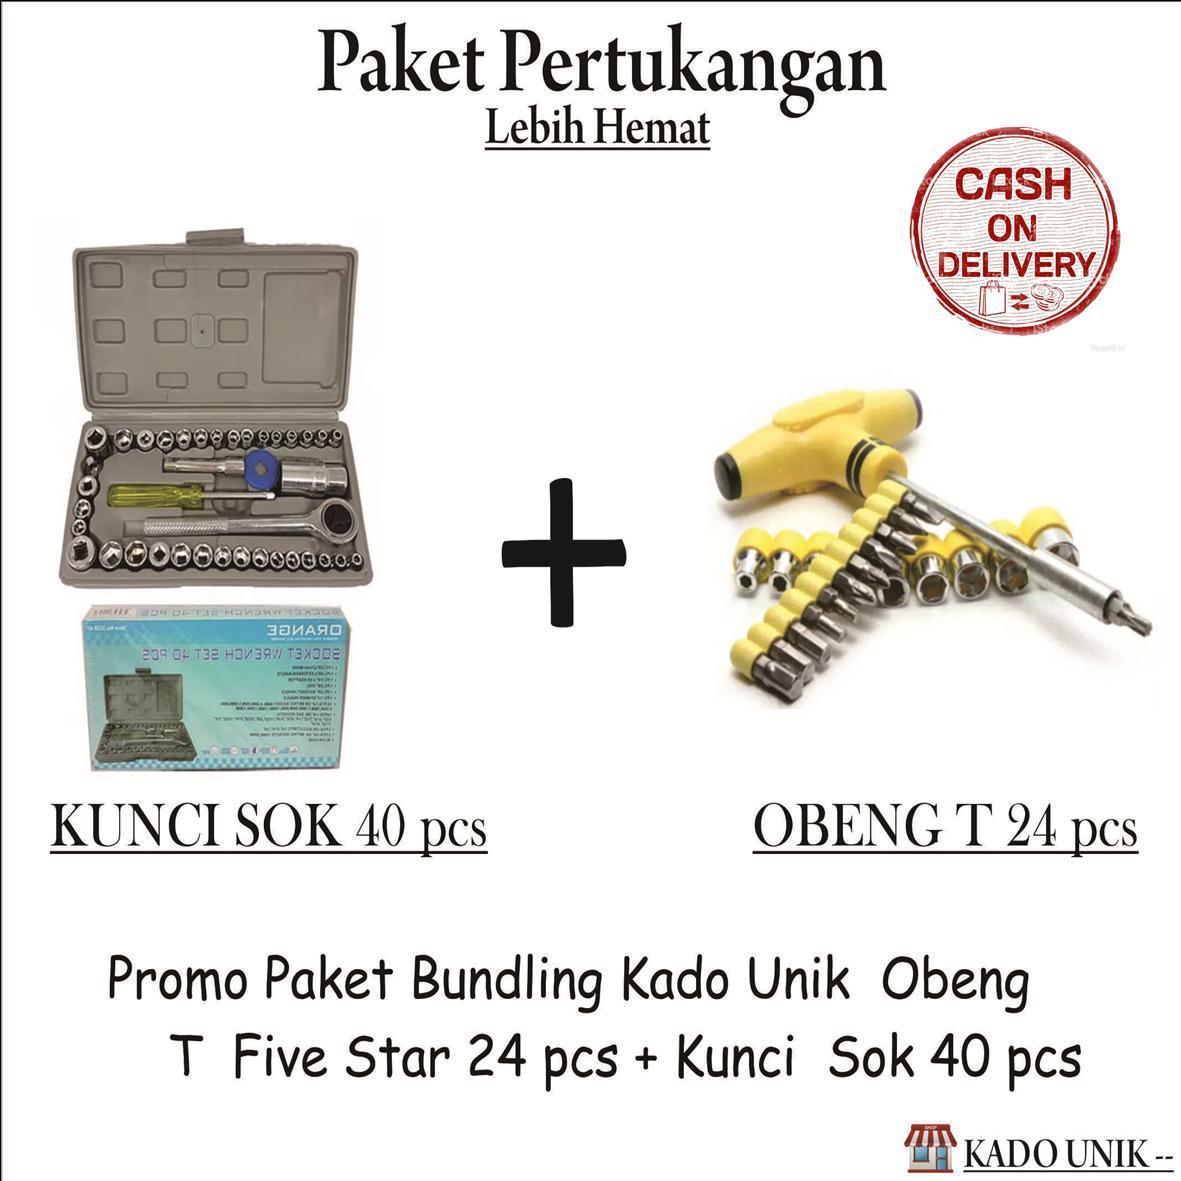 Alat Perkakas Tool Kit Screwdriver Set Obeng Baut Tekiro Kado Unik Promo Paket Hemat Bundling Pertukangan Kunci Sok 40 Pcs Dan